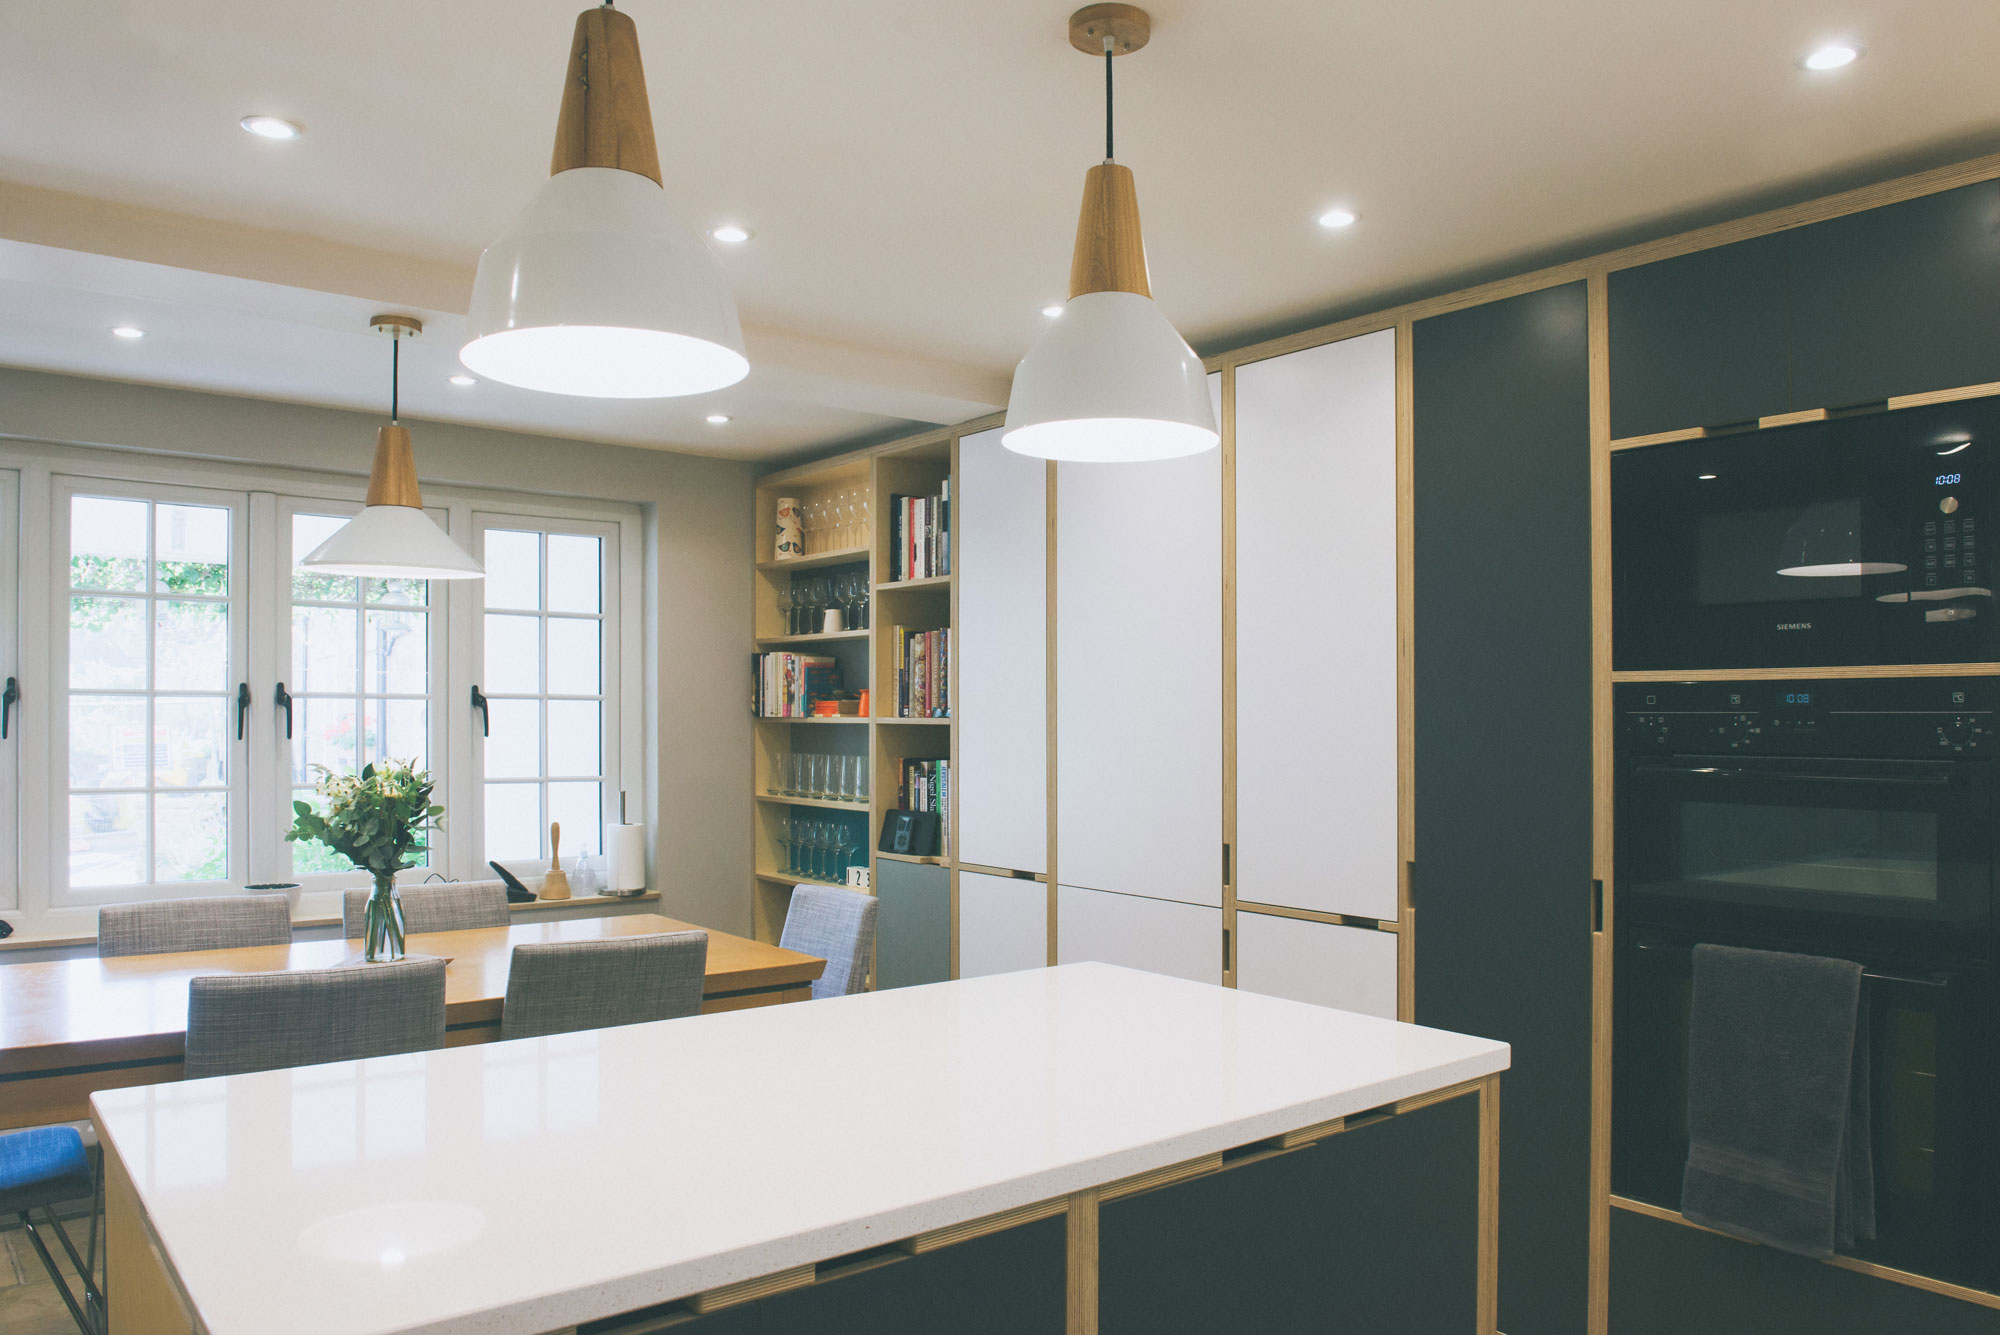 Open plan plywood kitchen diner